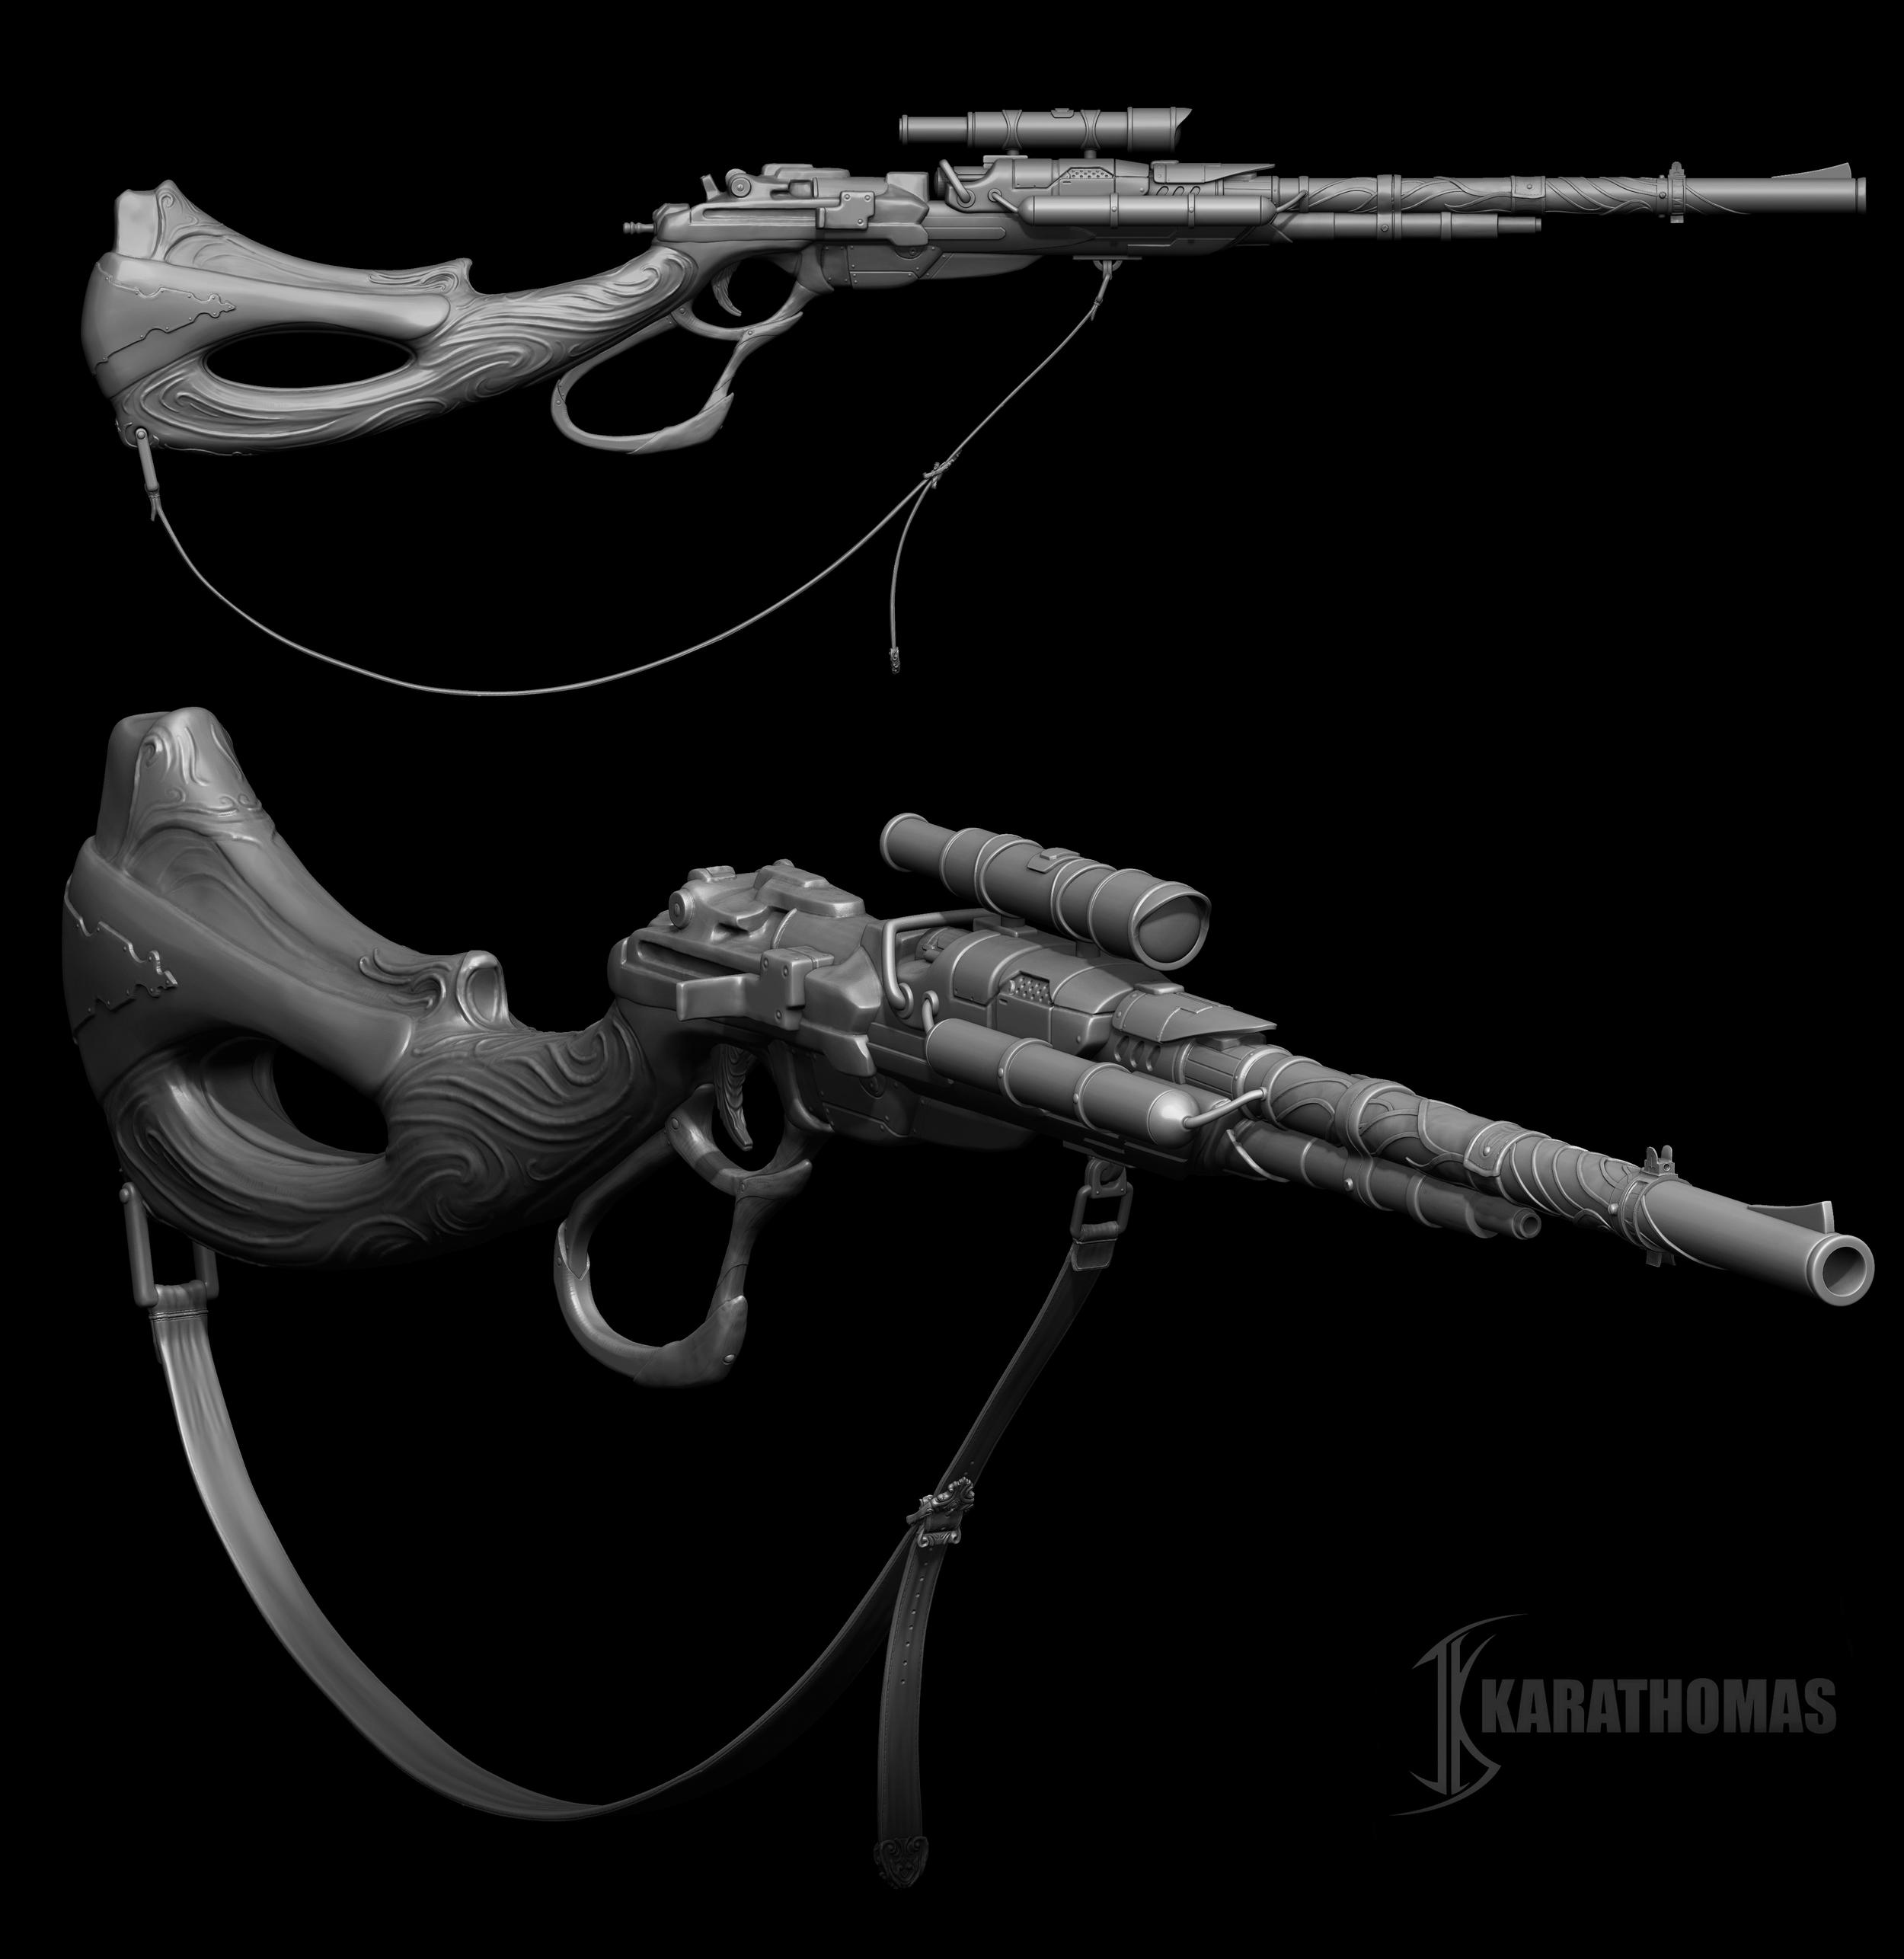 rifle_side.jpg